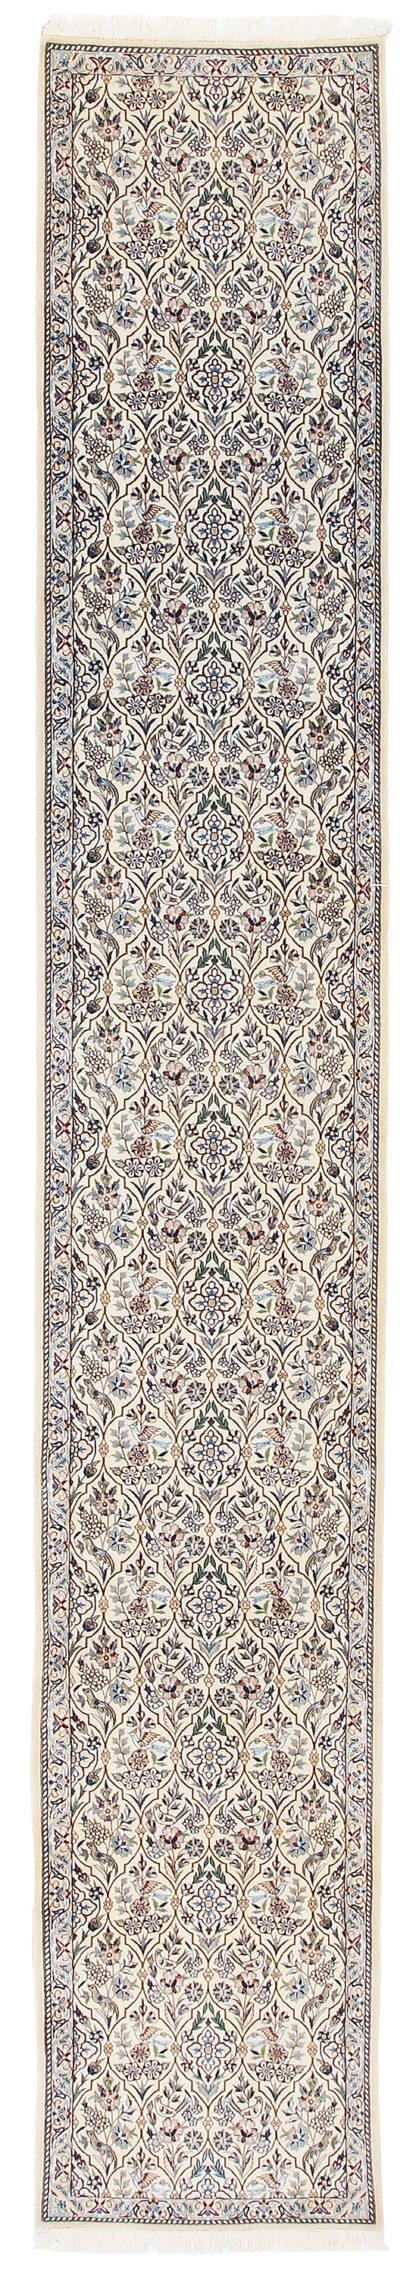 Persian Nain Wool Silk Runner 2x13 Ivory Blue Area Rug